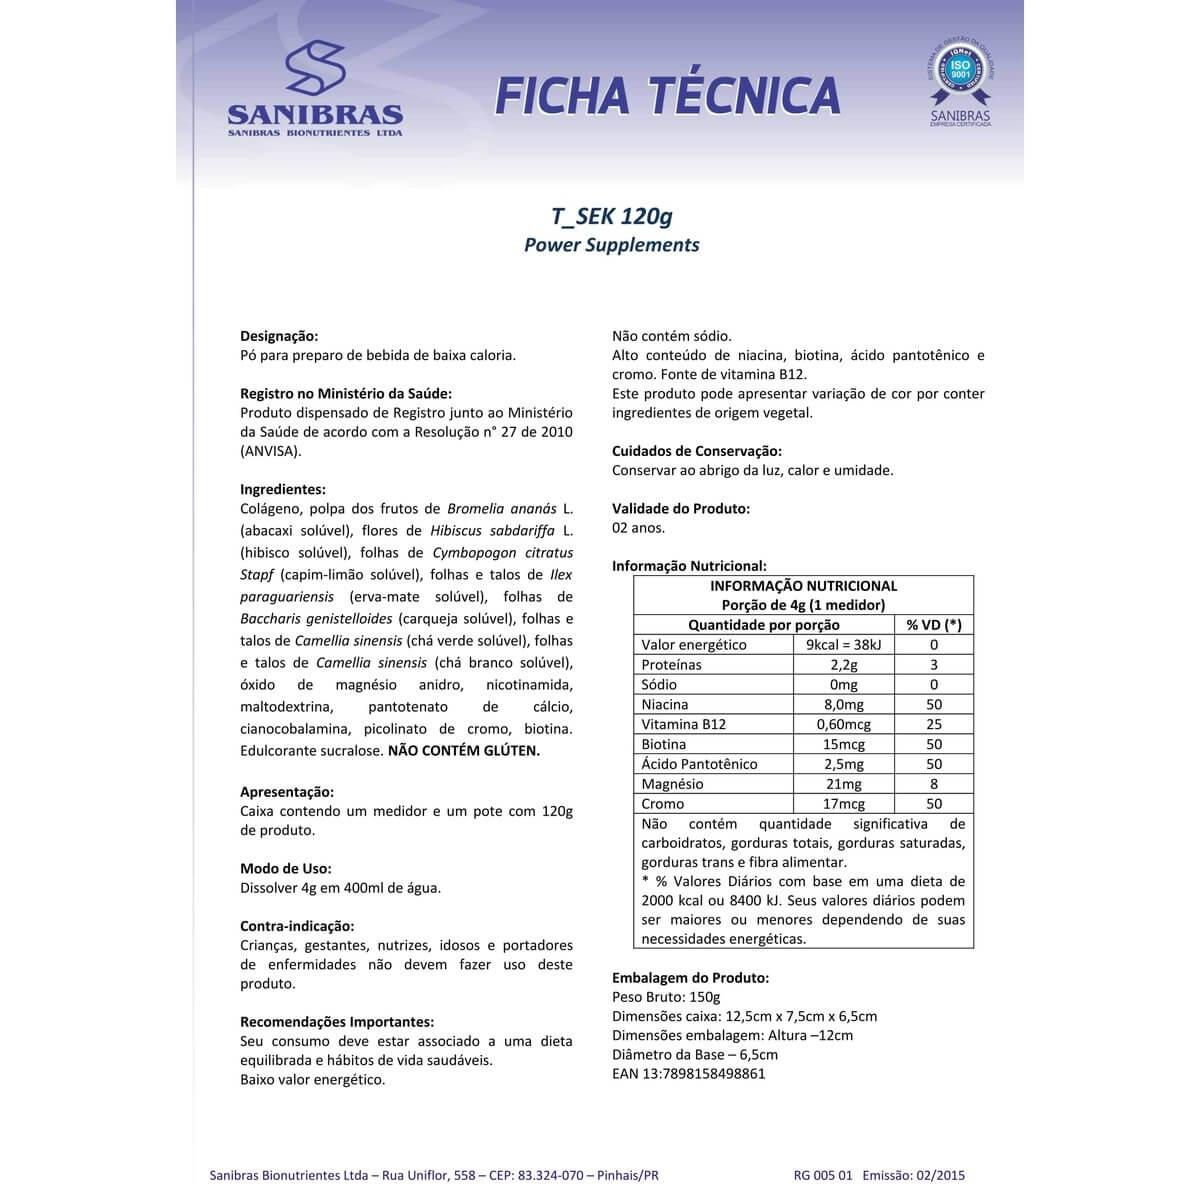 T_Sek Power Supplements - 120g